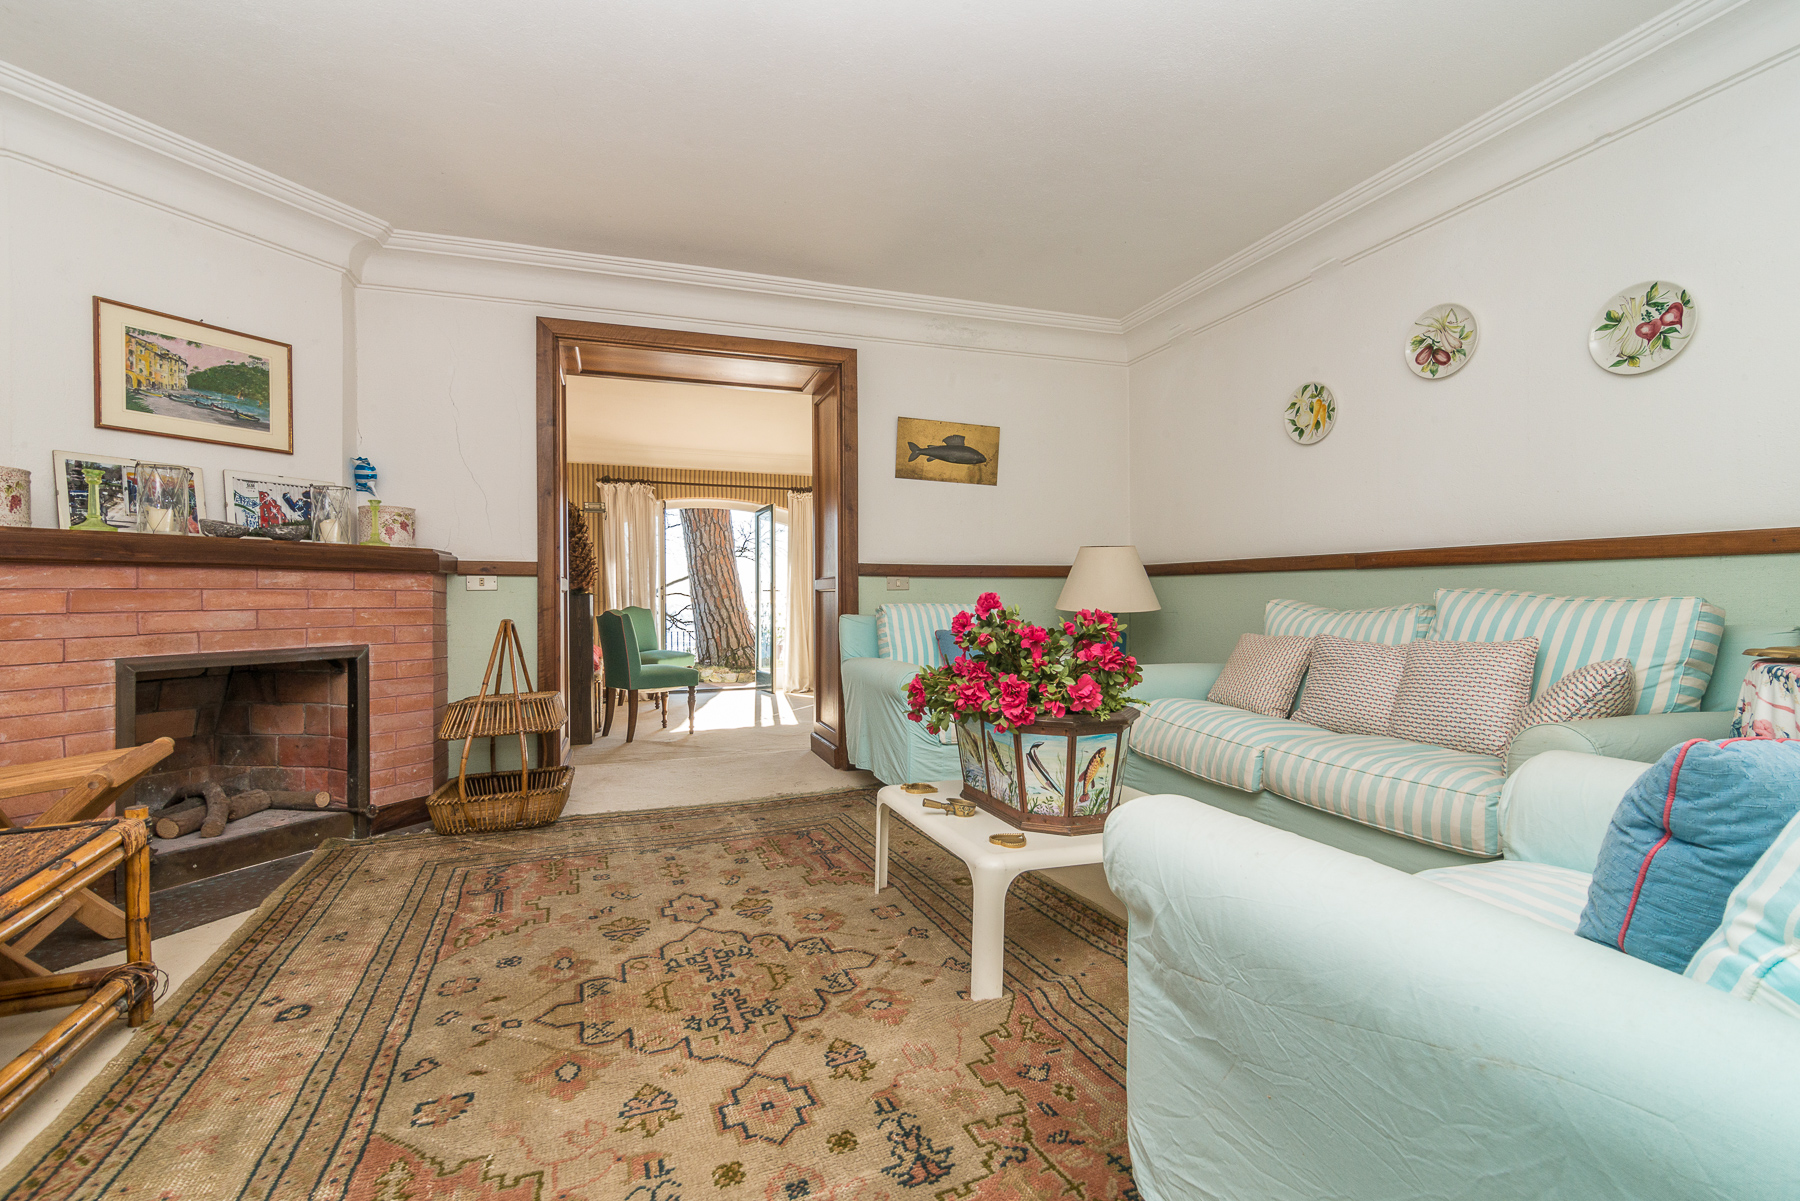 Villa in Vendita a Santa Margherita Ligure: 5 locali, 440 mq - Foto 28